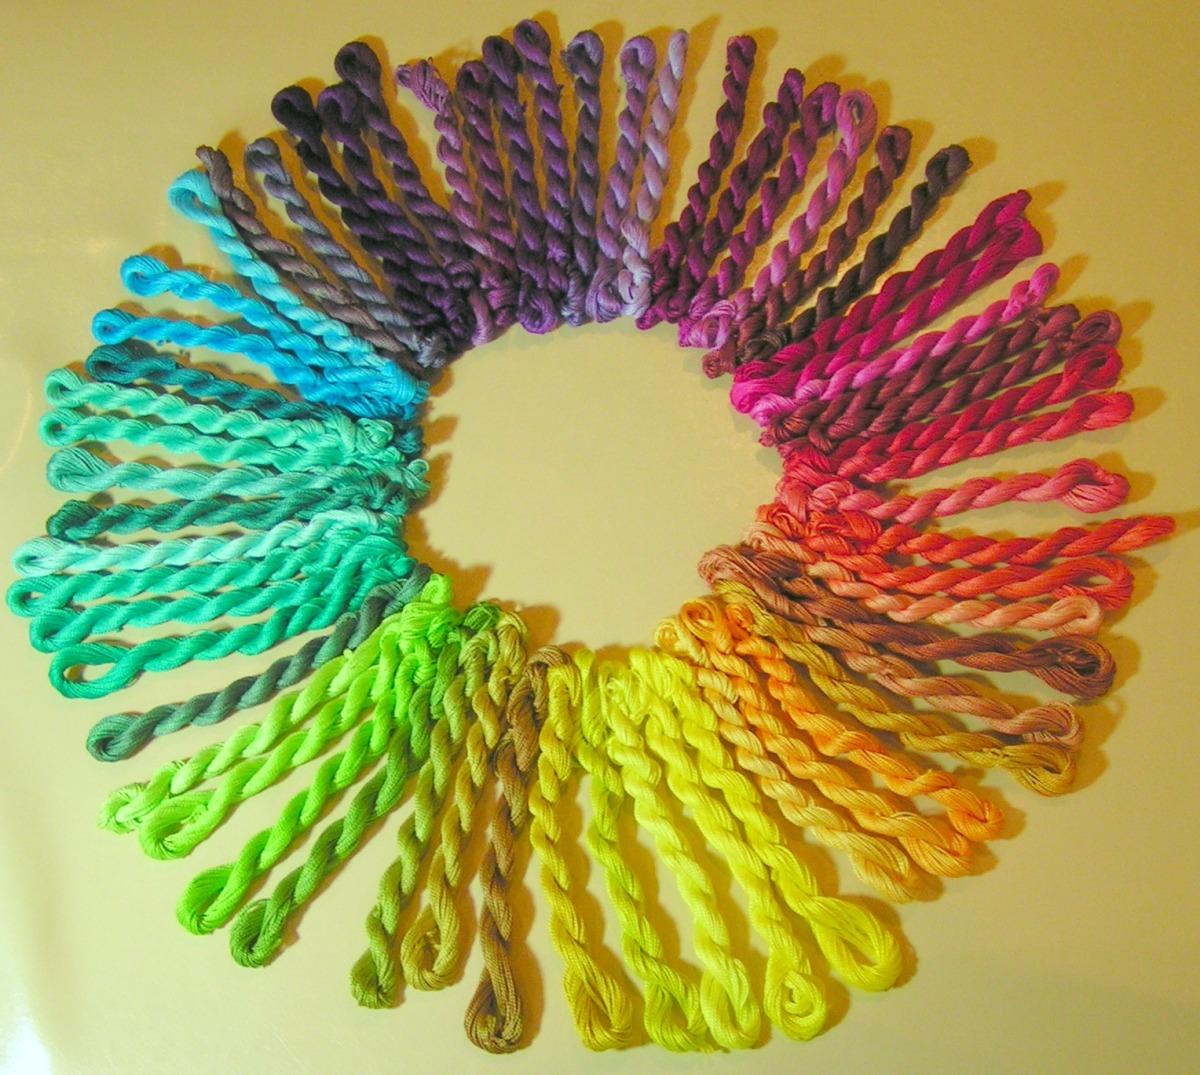 Focus On Color In 2015 1st Quarter Studio Challenge